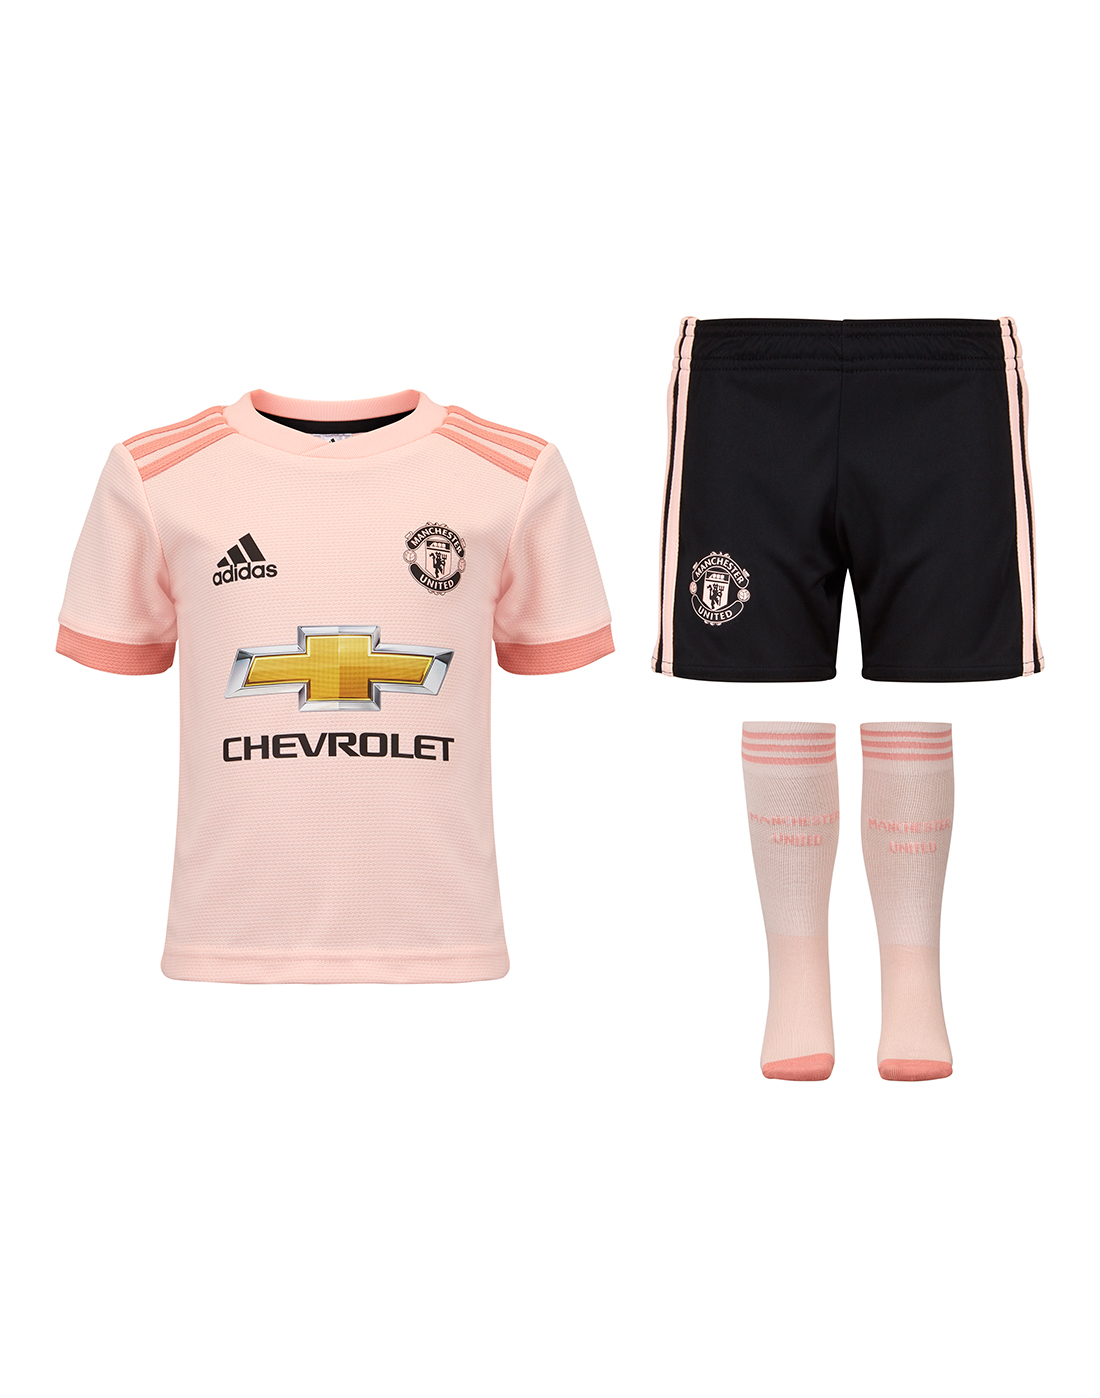 254e90a2210 Kids Man United 18 19 Away Kit